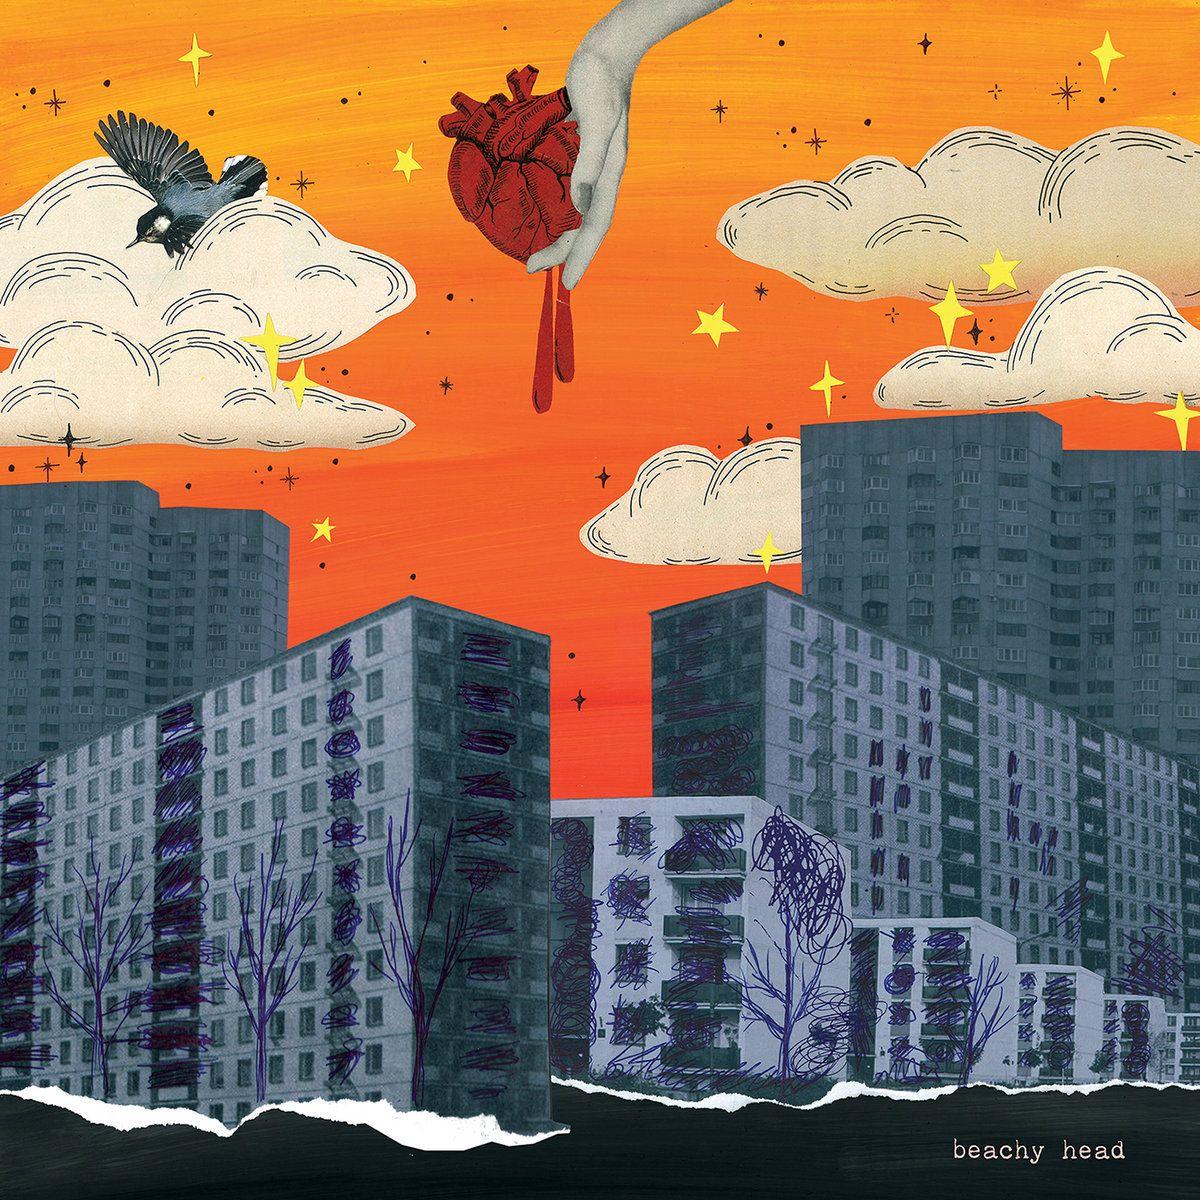 beachy head slowdive flamboyantes lèvres supergroupe album artwork